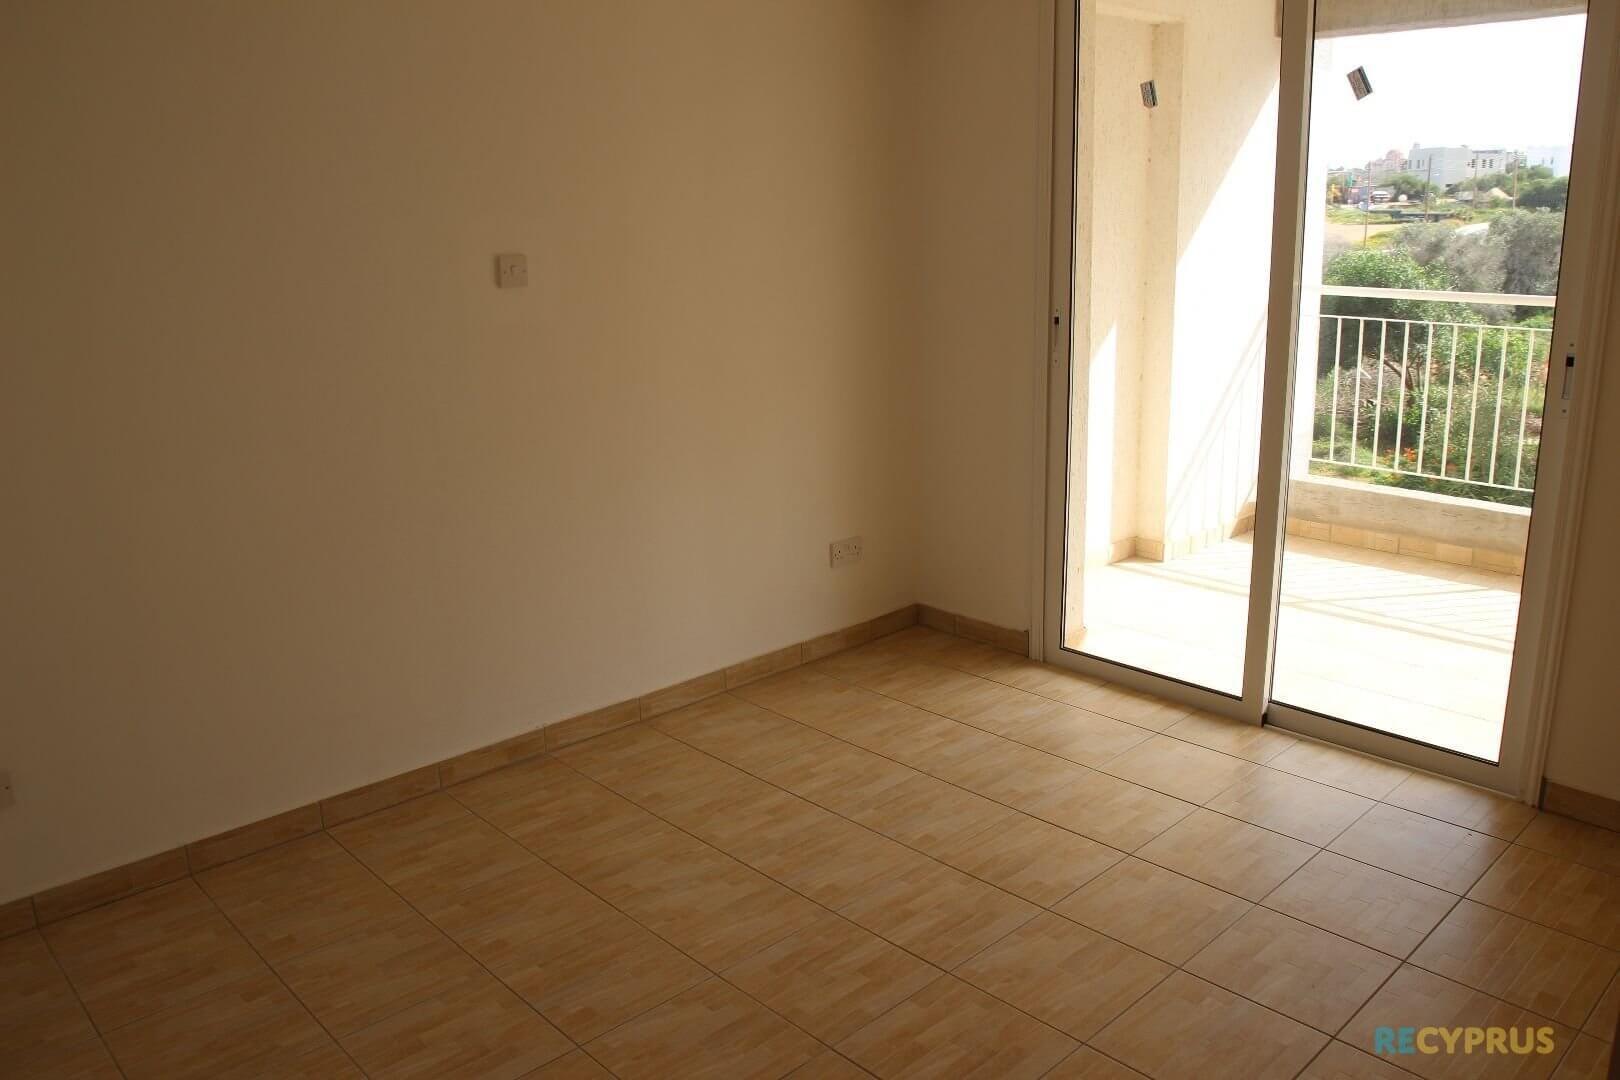 Apartment for sale Kapparis Famagusta Cyprus 6 3519